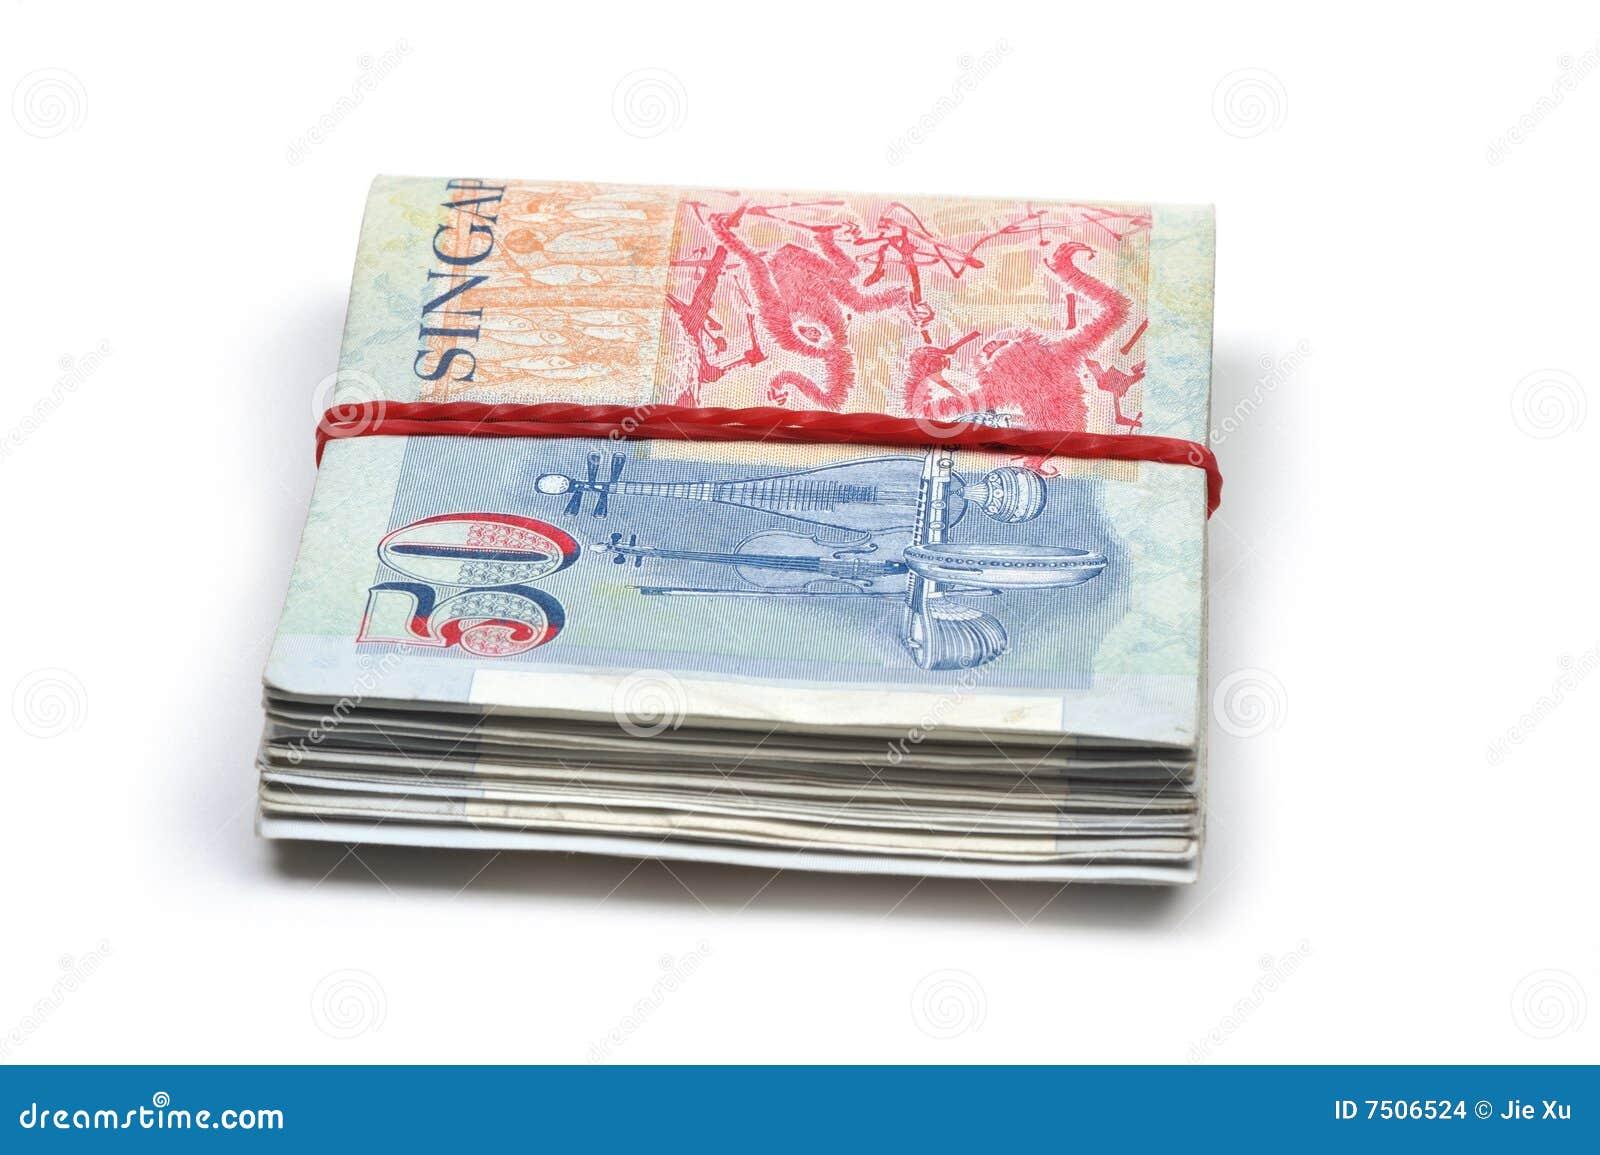 A Bundled Up Stack Of Singapore Dollars Stock Photo